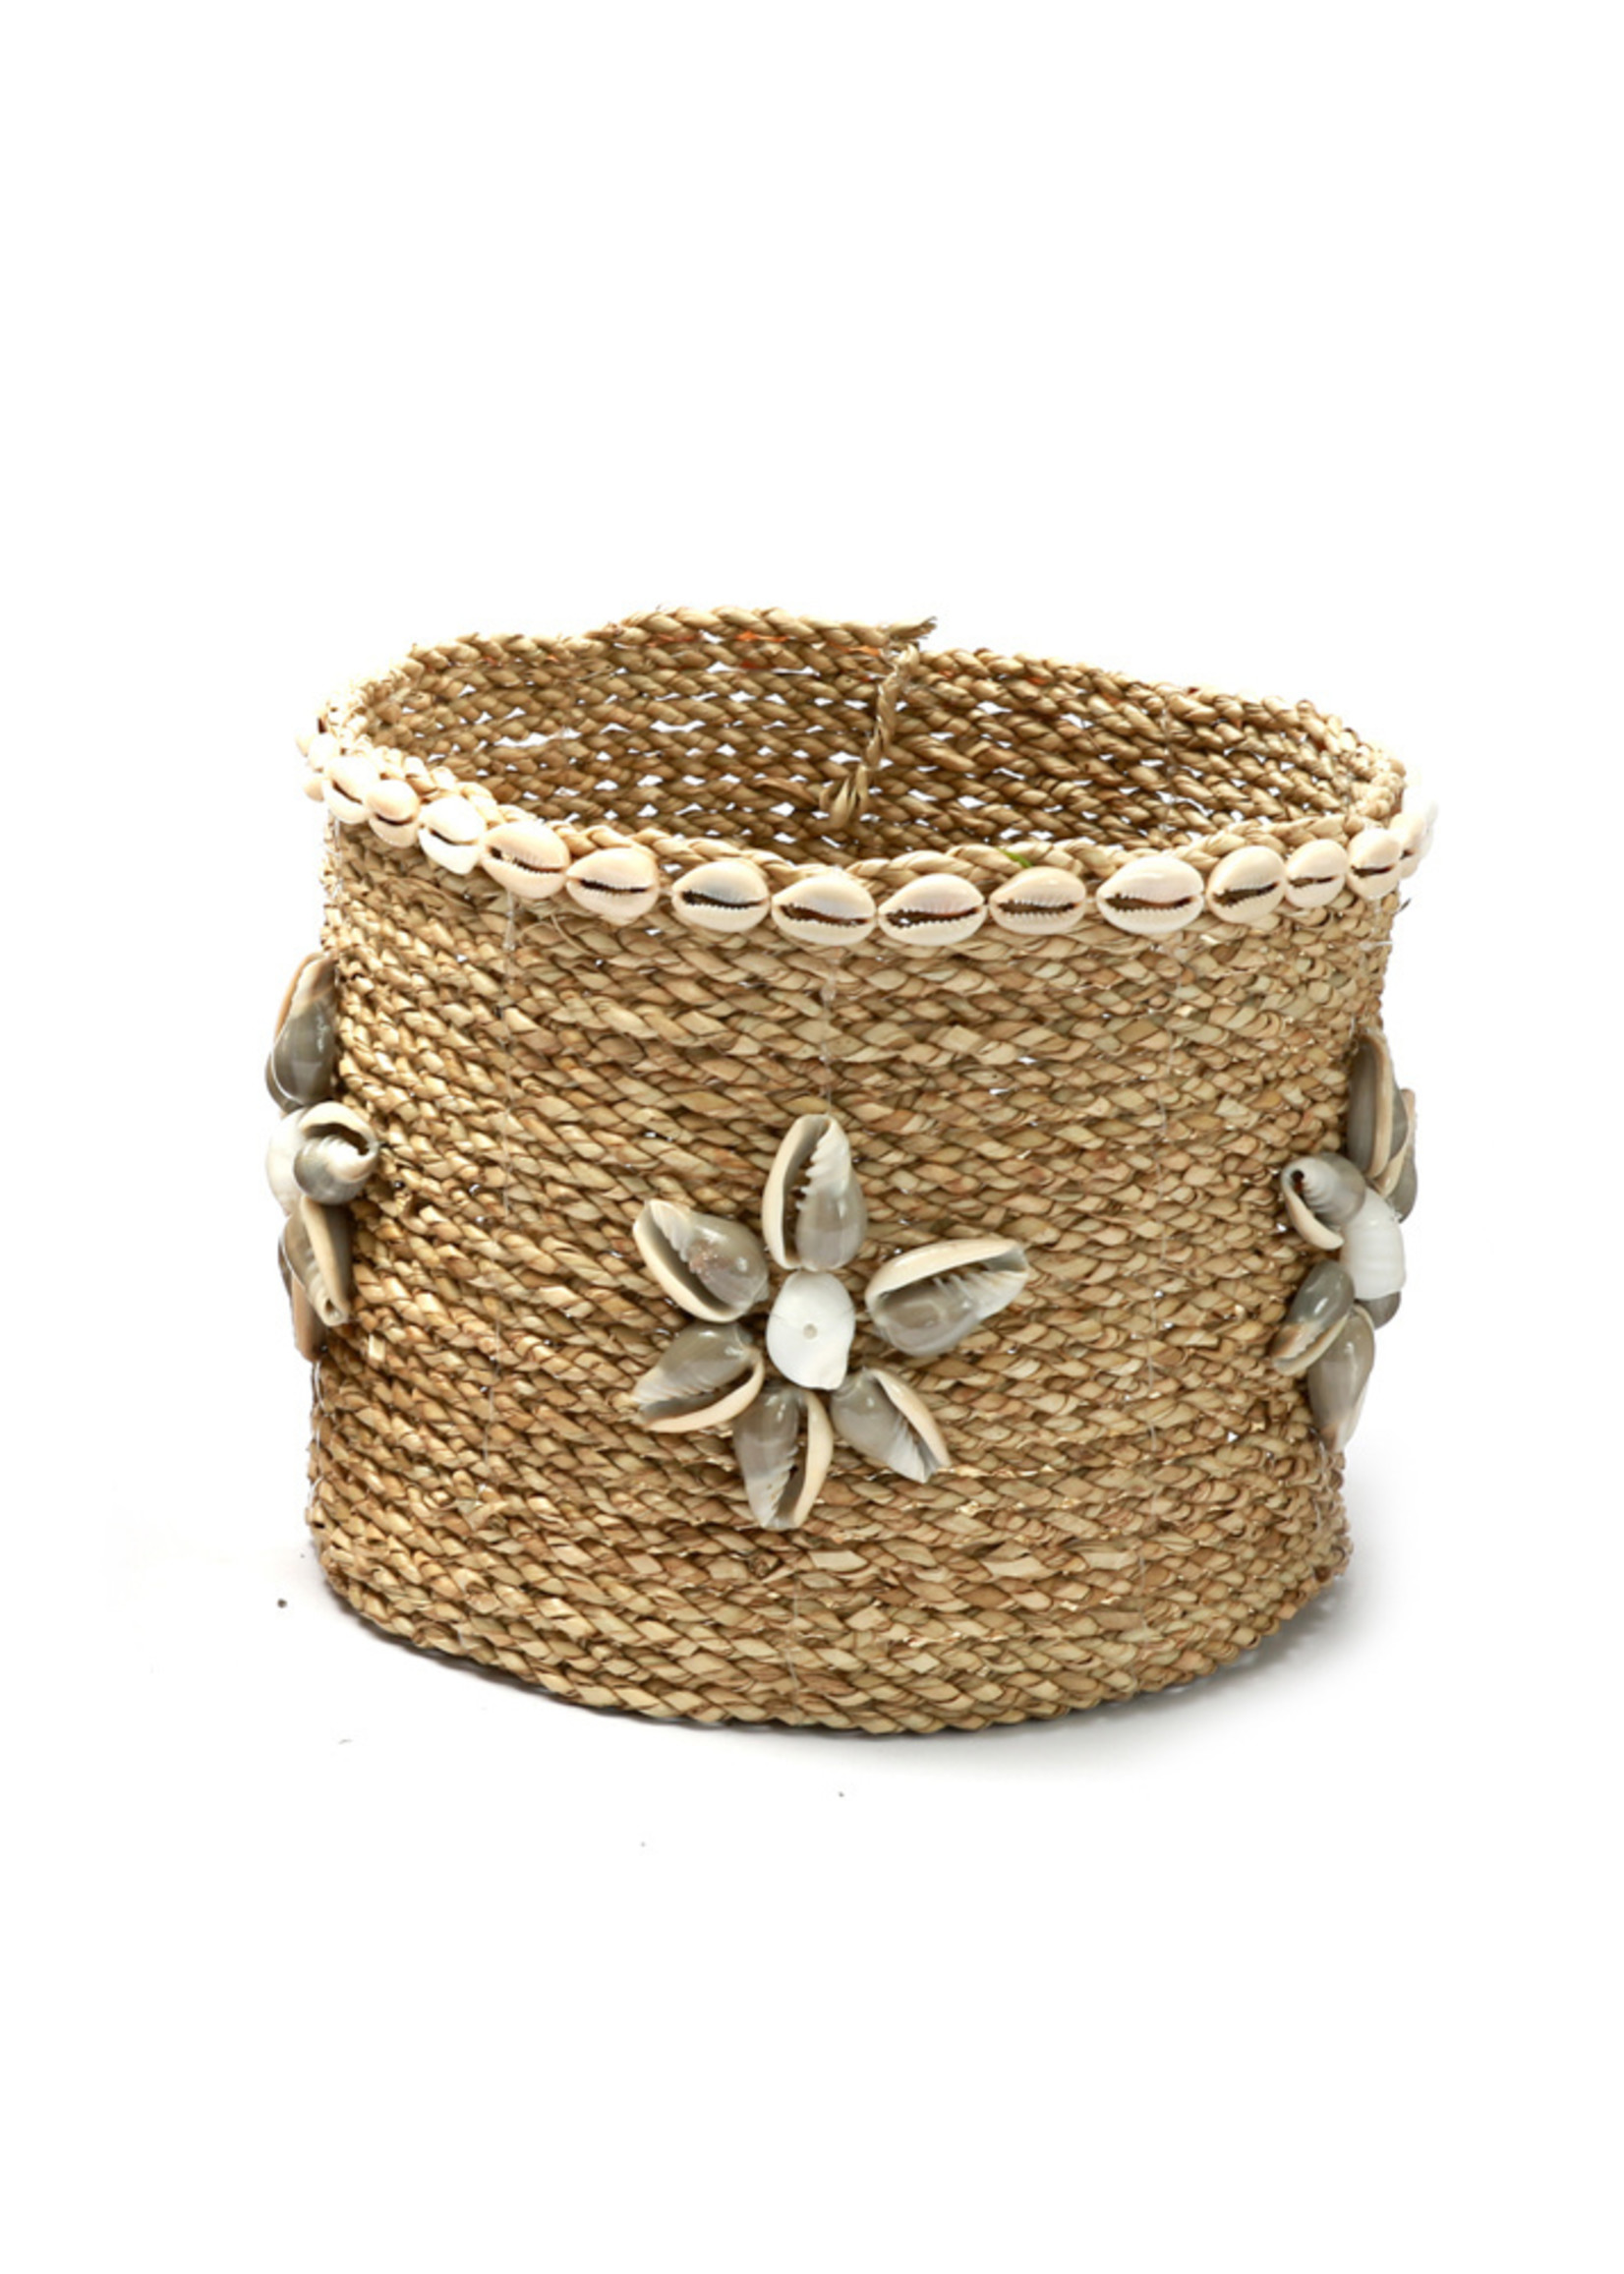 The Beach View Baskets - Natural - M